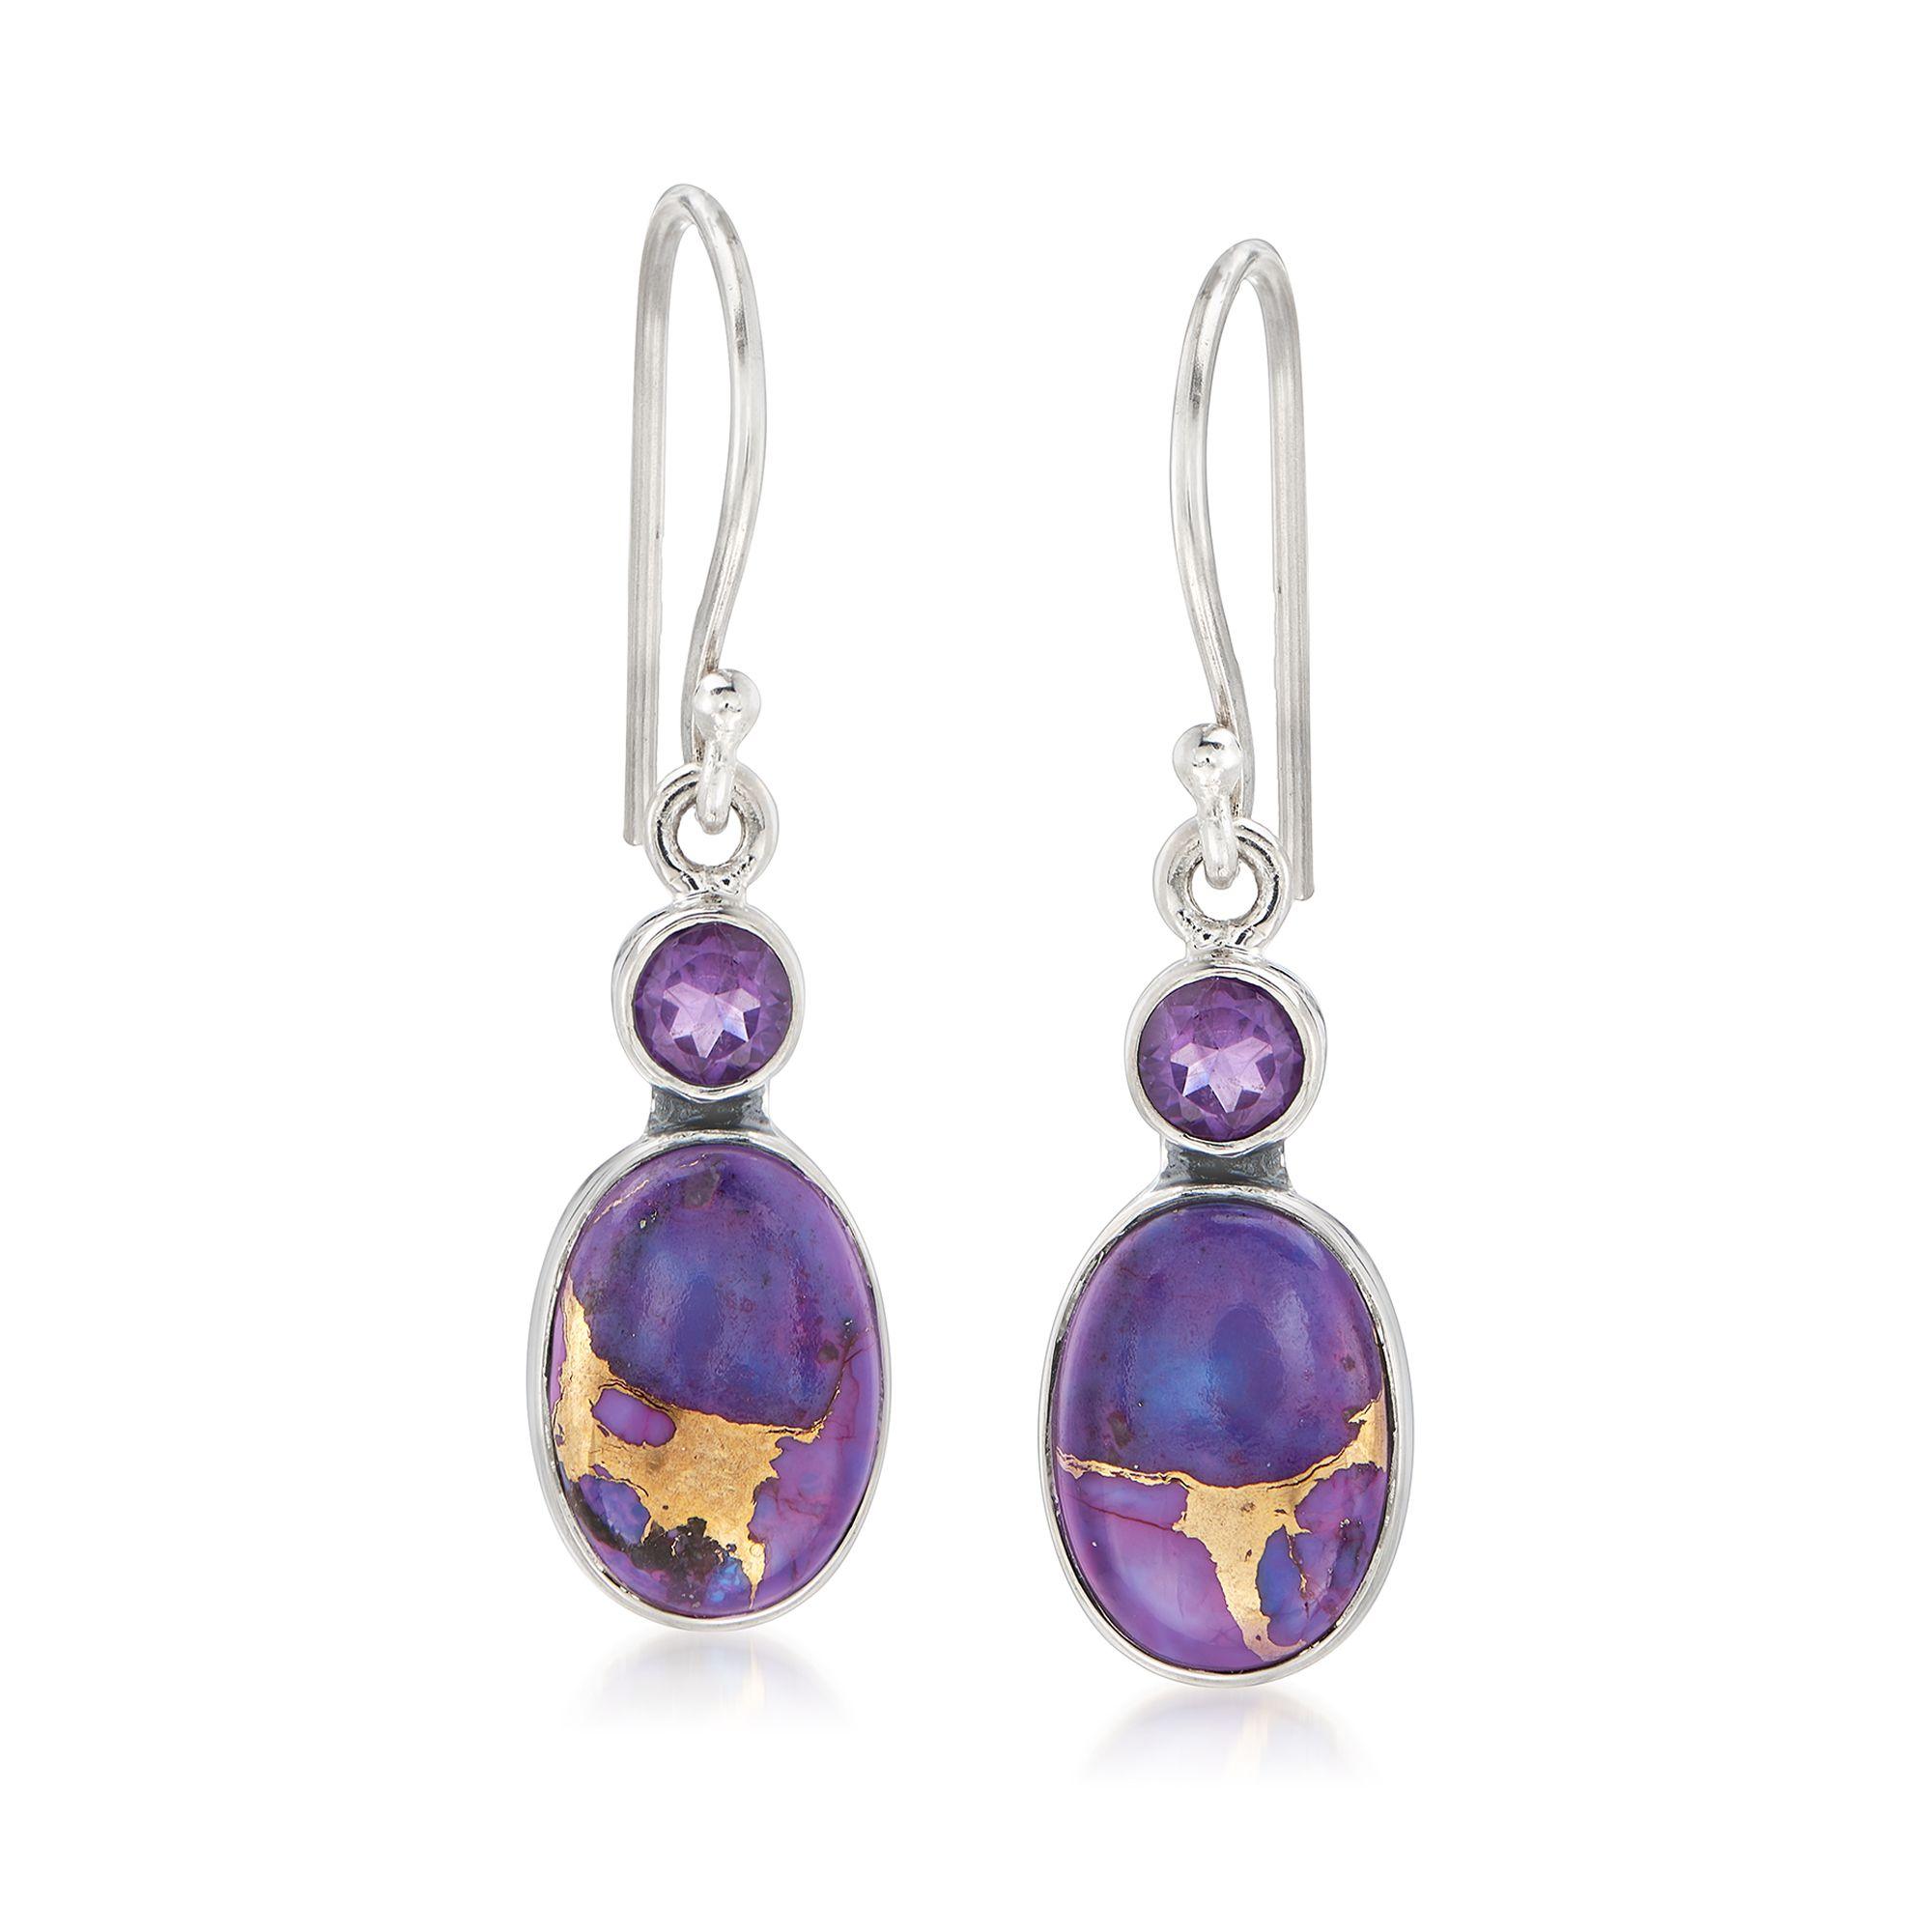 Ross-Simons Purple Kingman Turquoise and Amethyst Drop Earrings in Sterling Silver